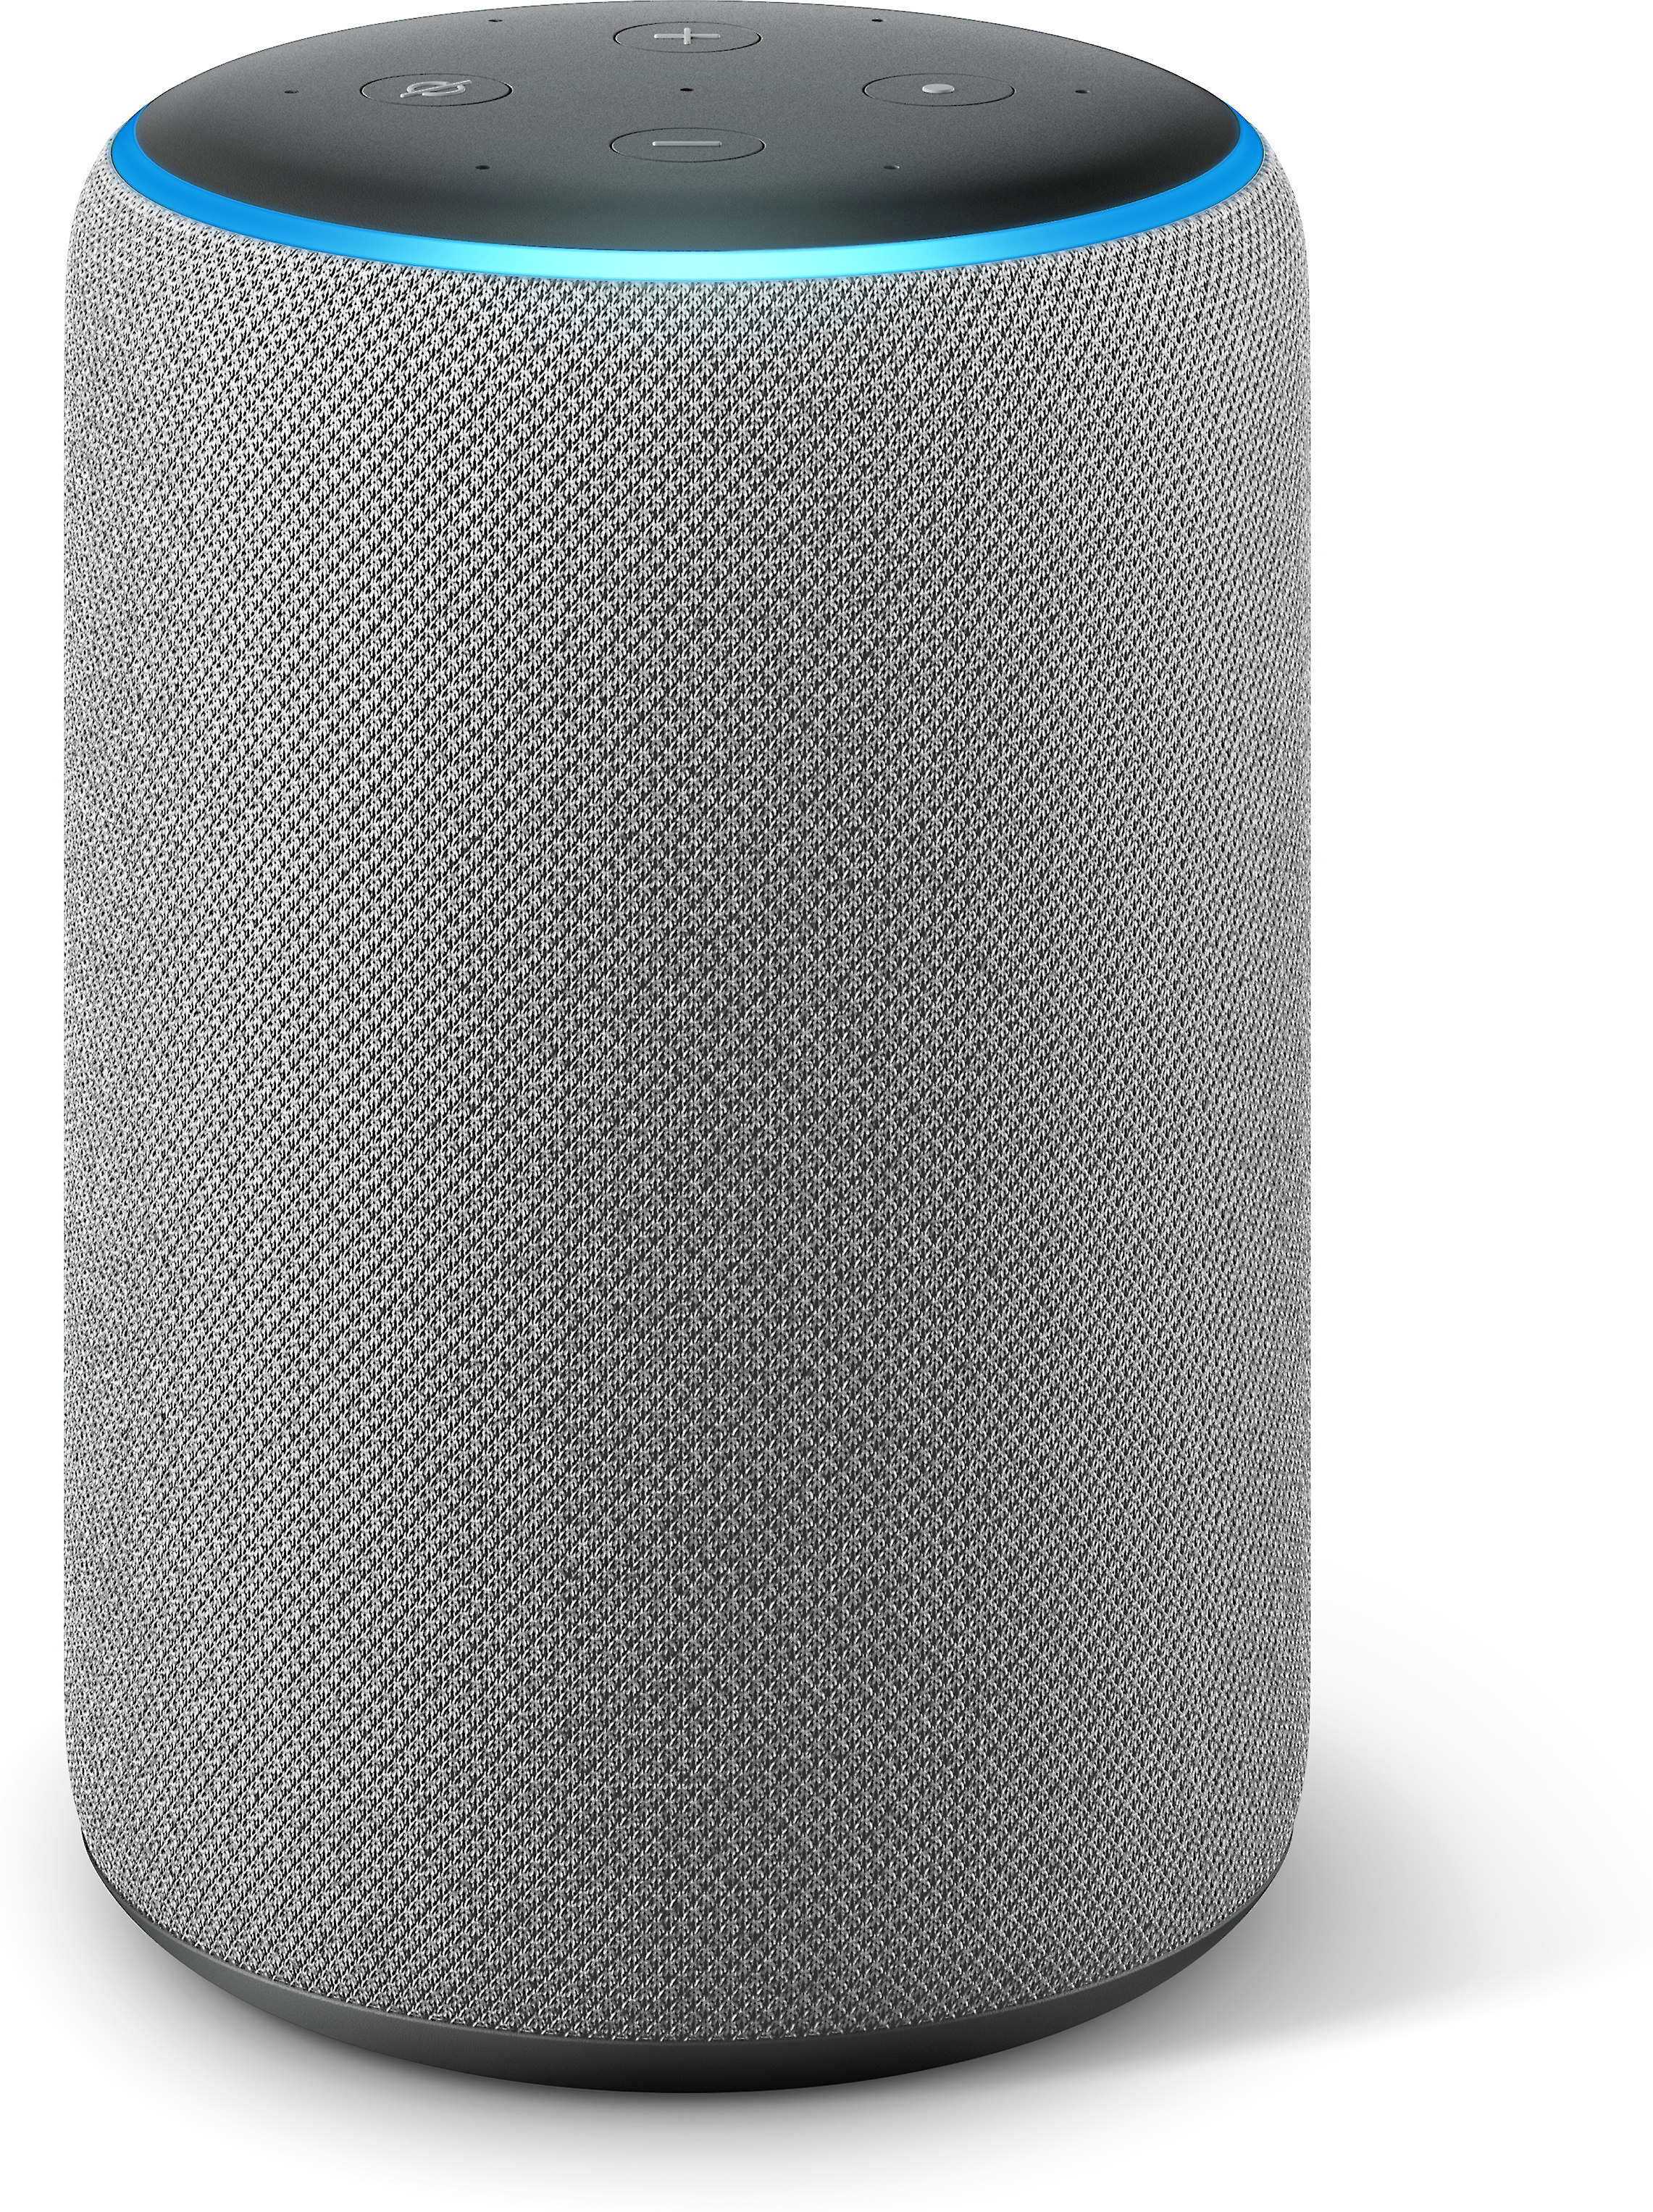 Amazon Echo Plus (2nd Generation) (Grey)